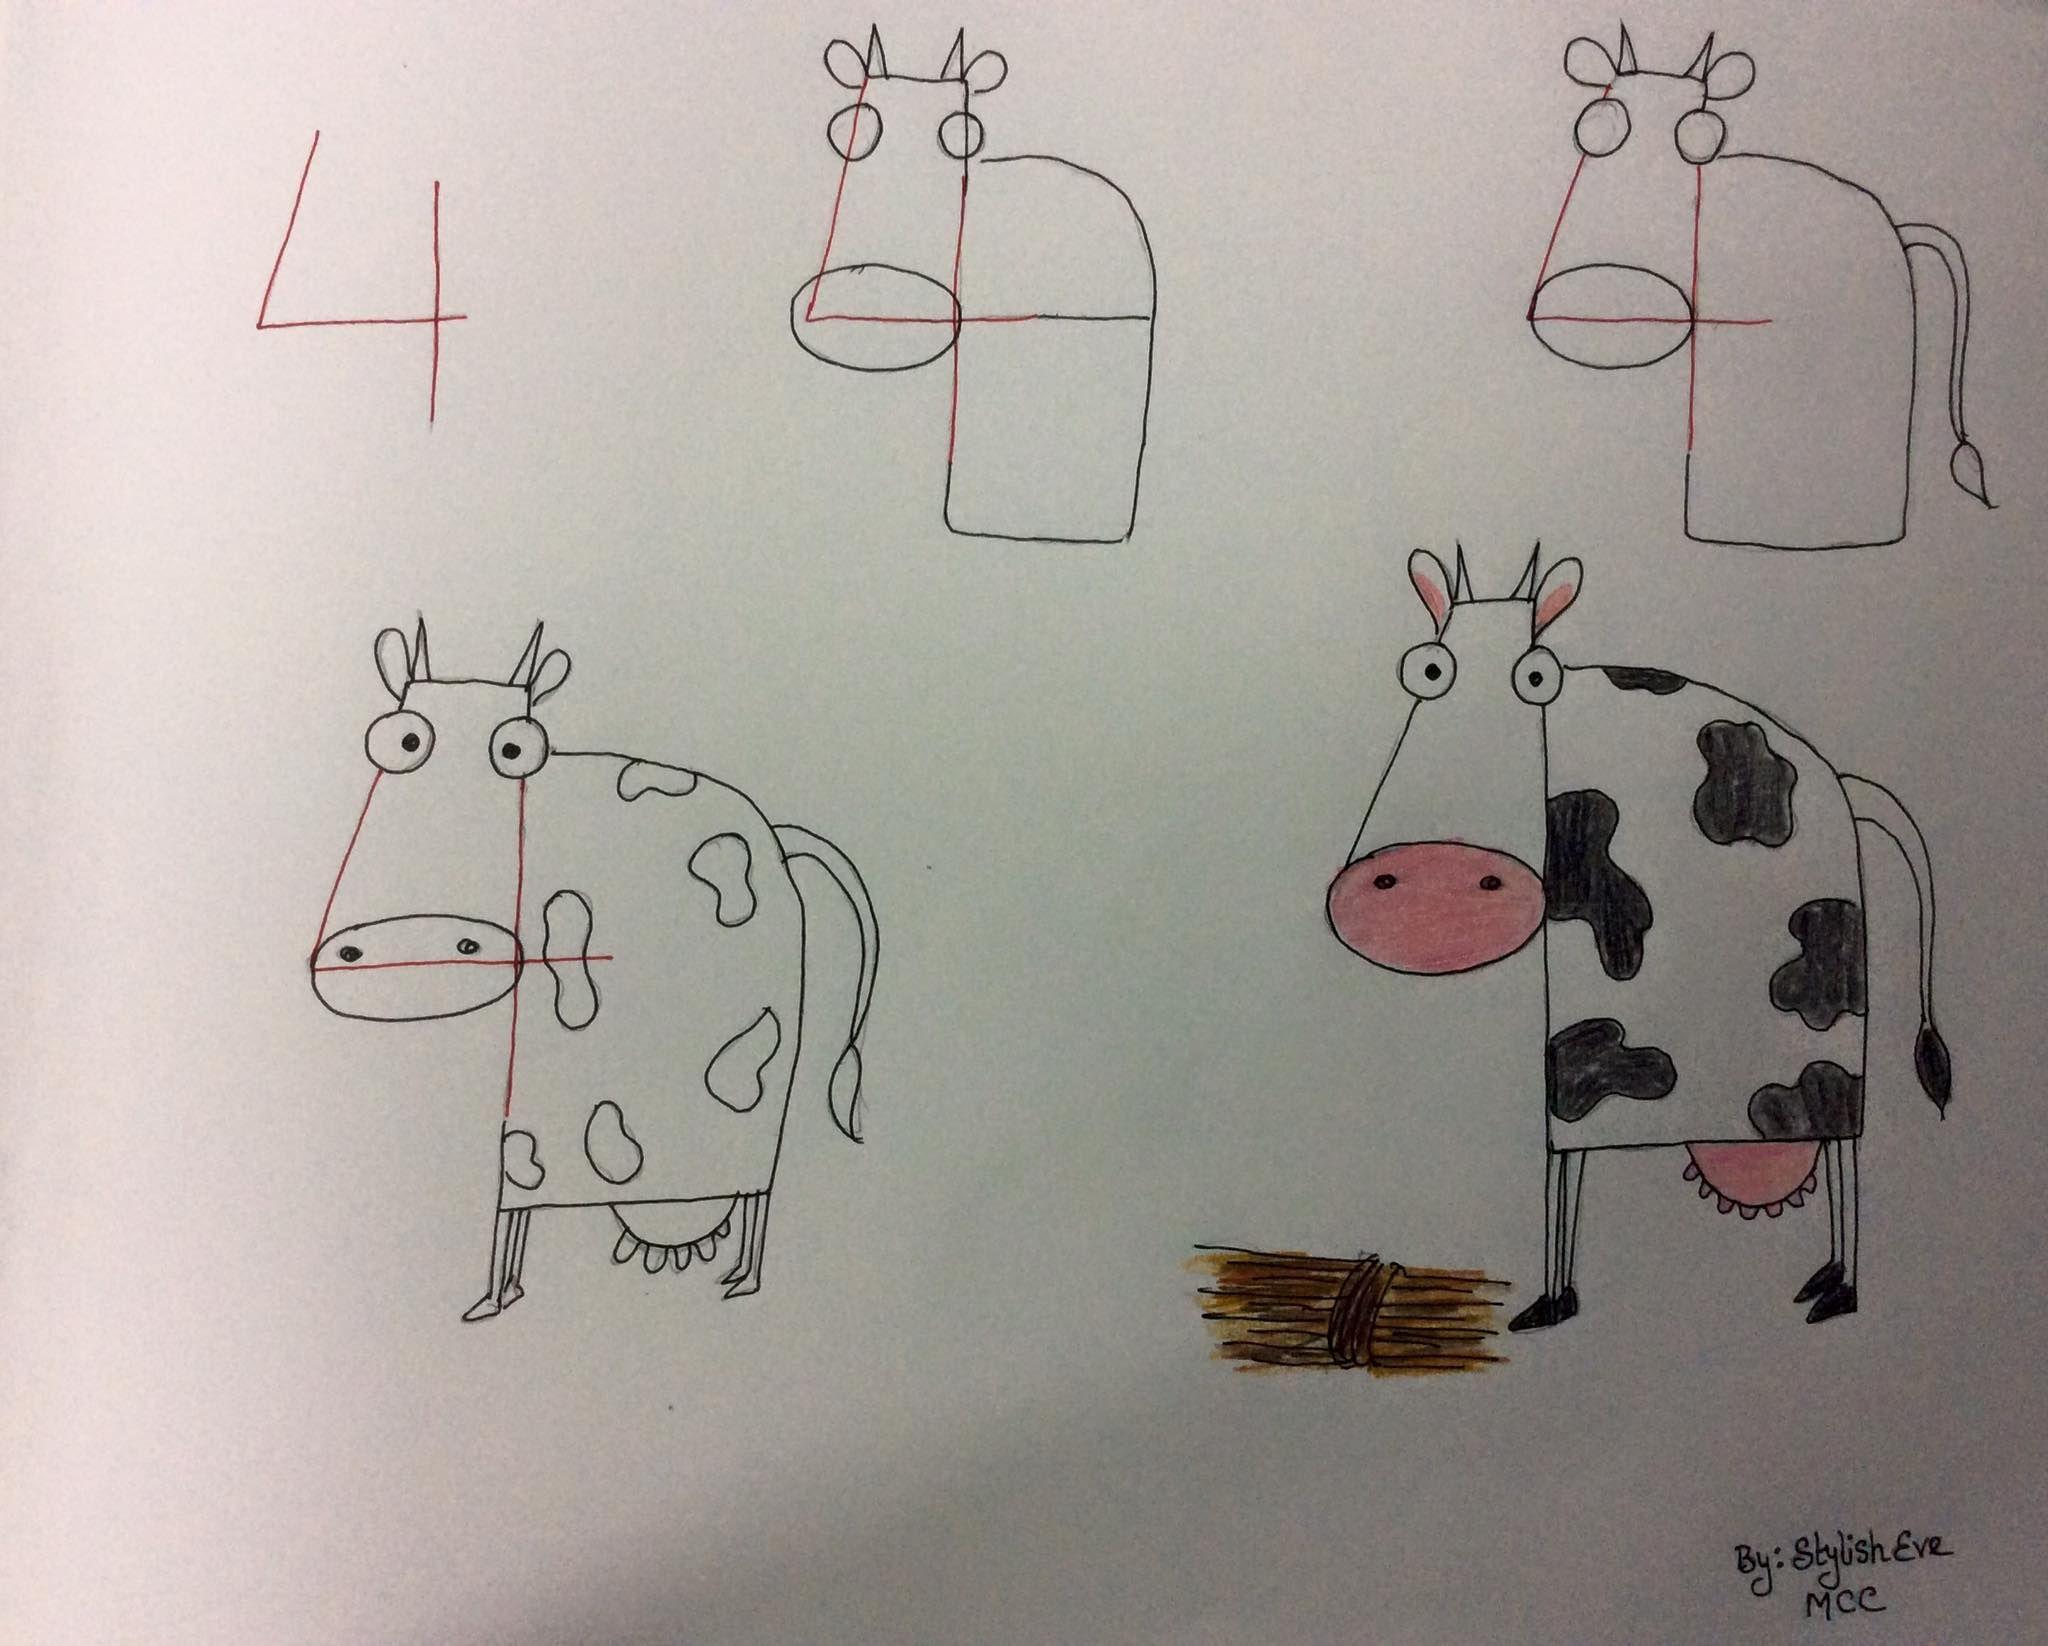 Enseña a los más peques a dibujar a partir de números y letras | Enseñar a  dibujar, Aprender a dibujar animales, Aprender a dibujar